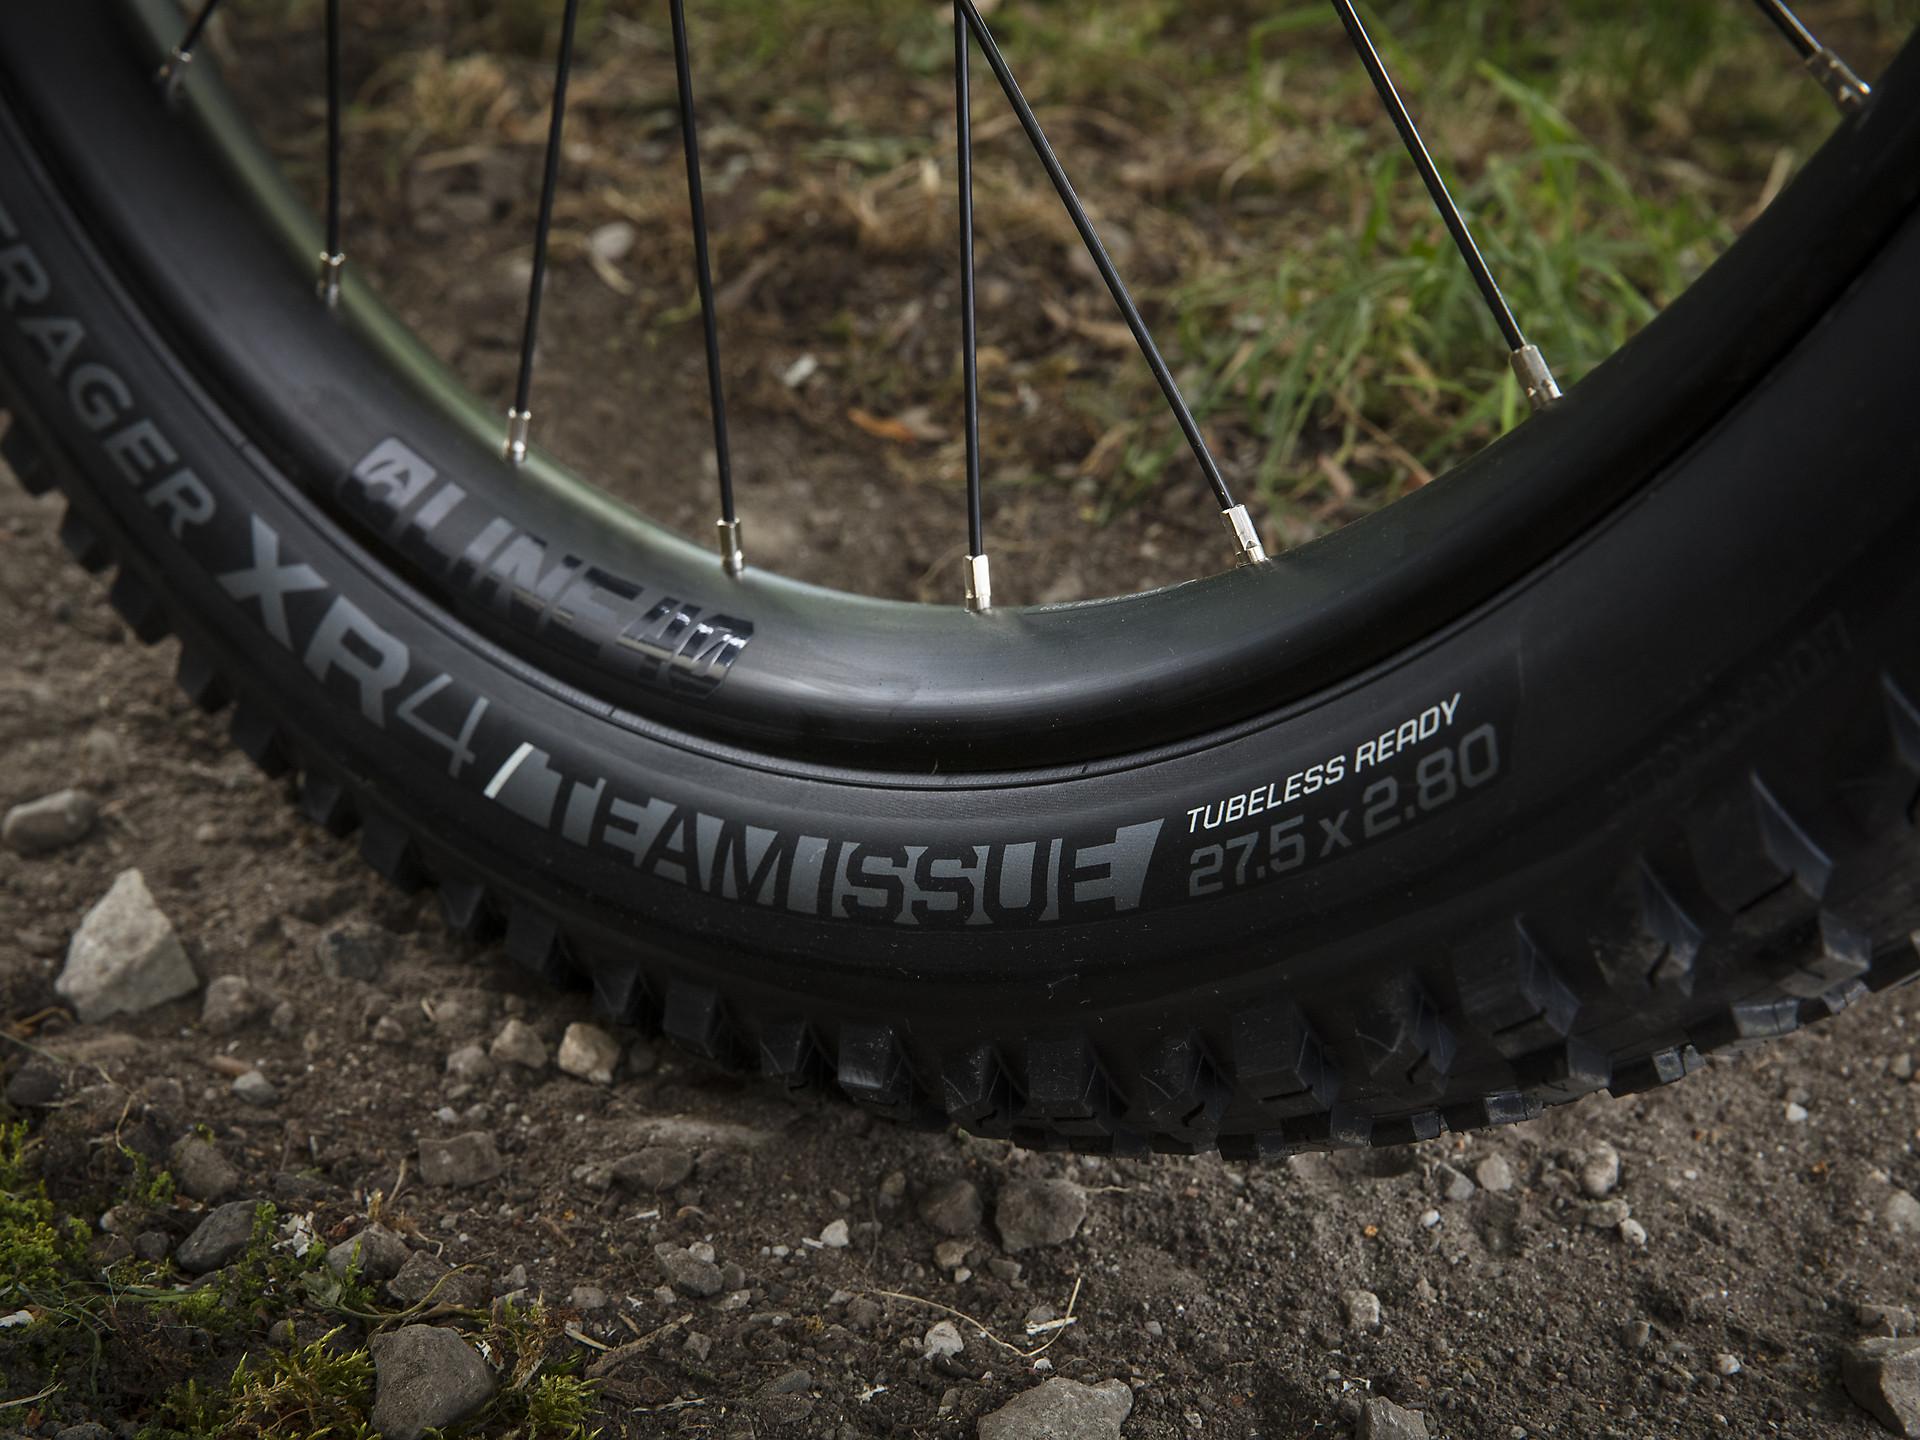 2c1d1d91 Powerfly FS 7 Plus | Trek Bikes (GB)